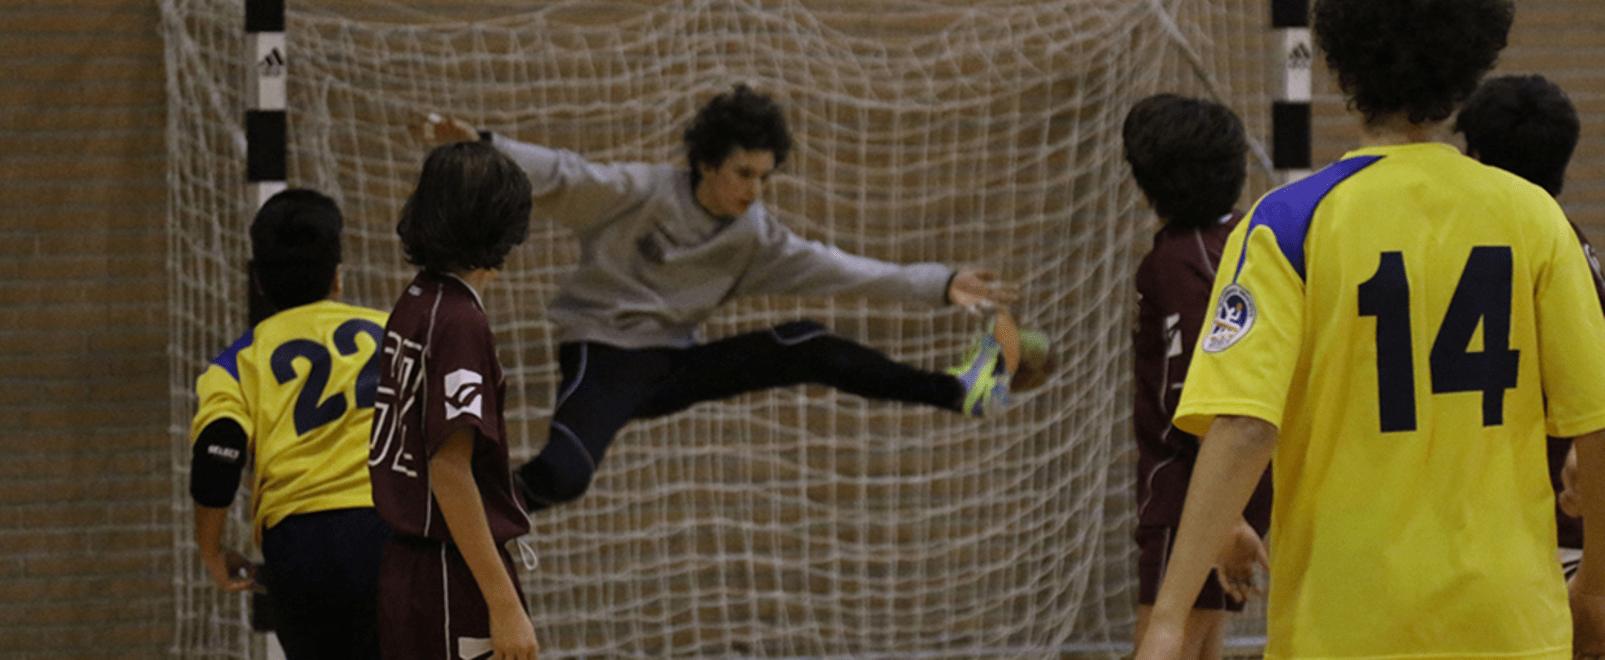 Pallamano: Idrobase CUS Venezia fallisce il primo test match Under 14